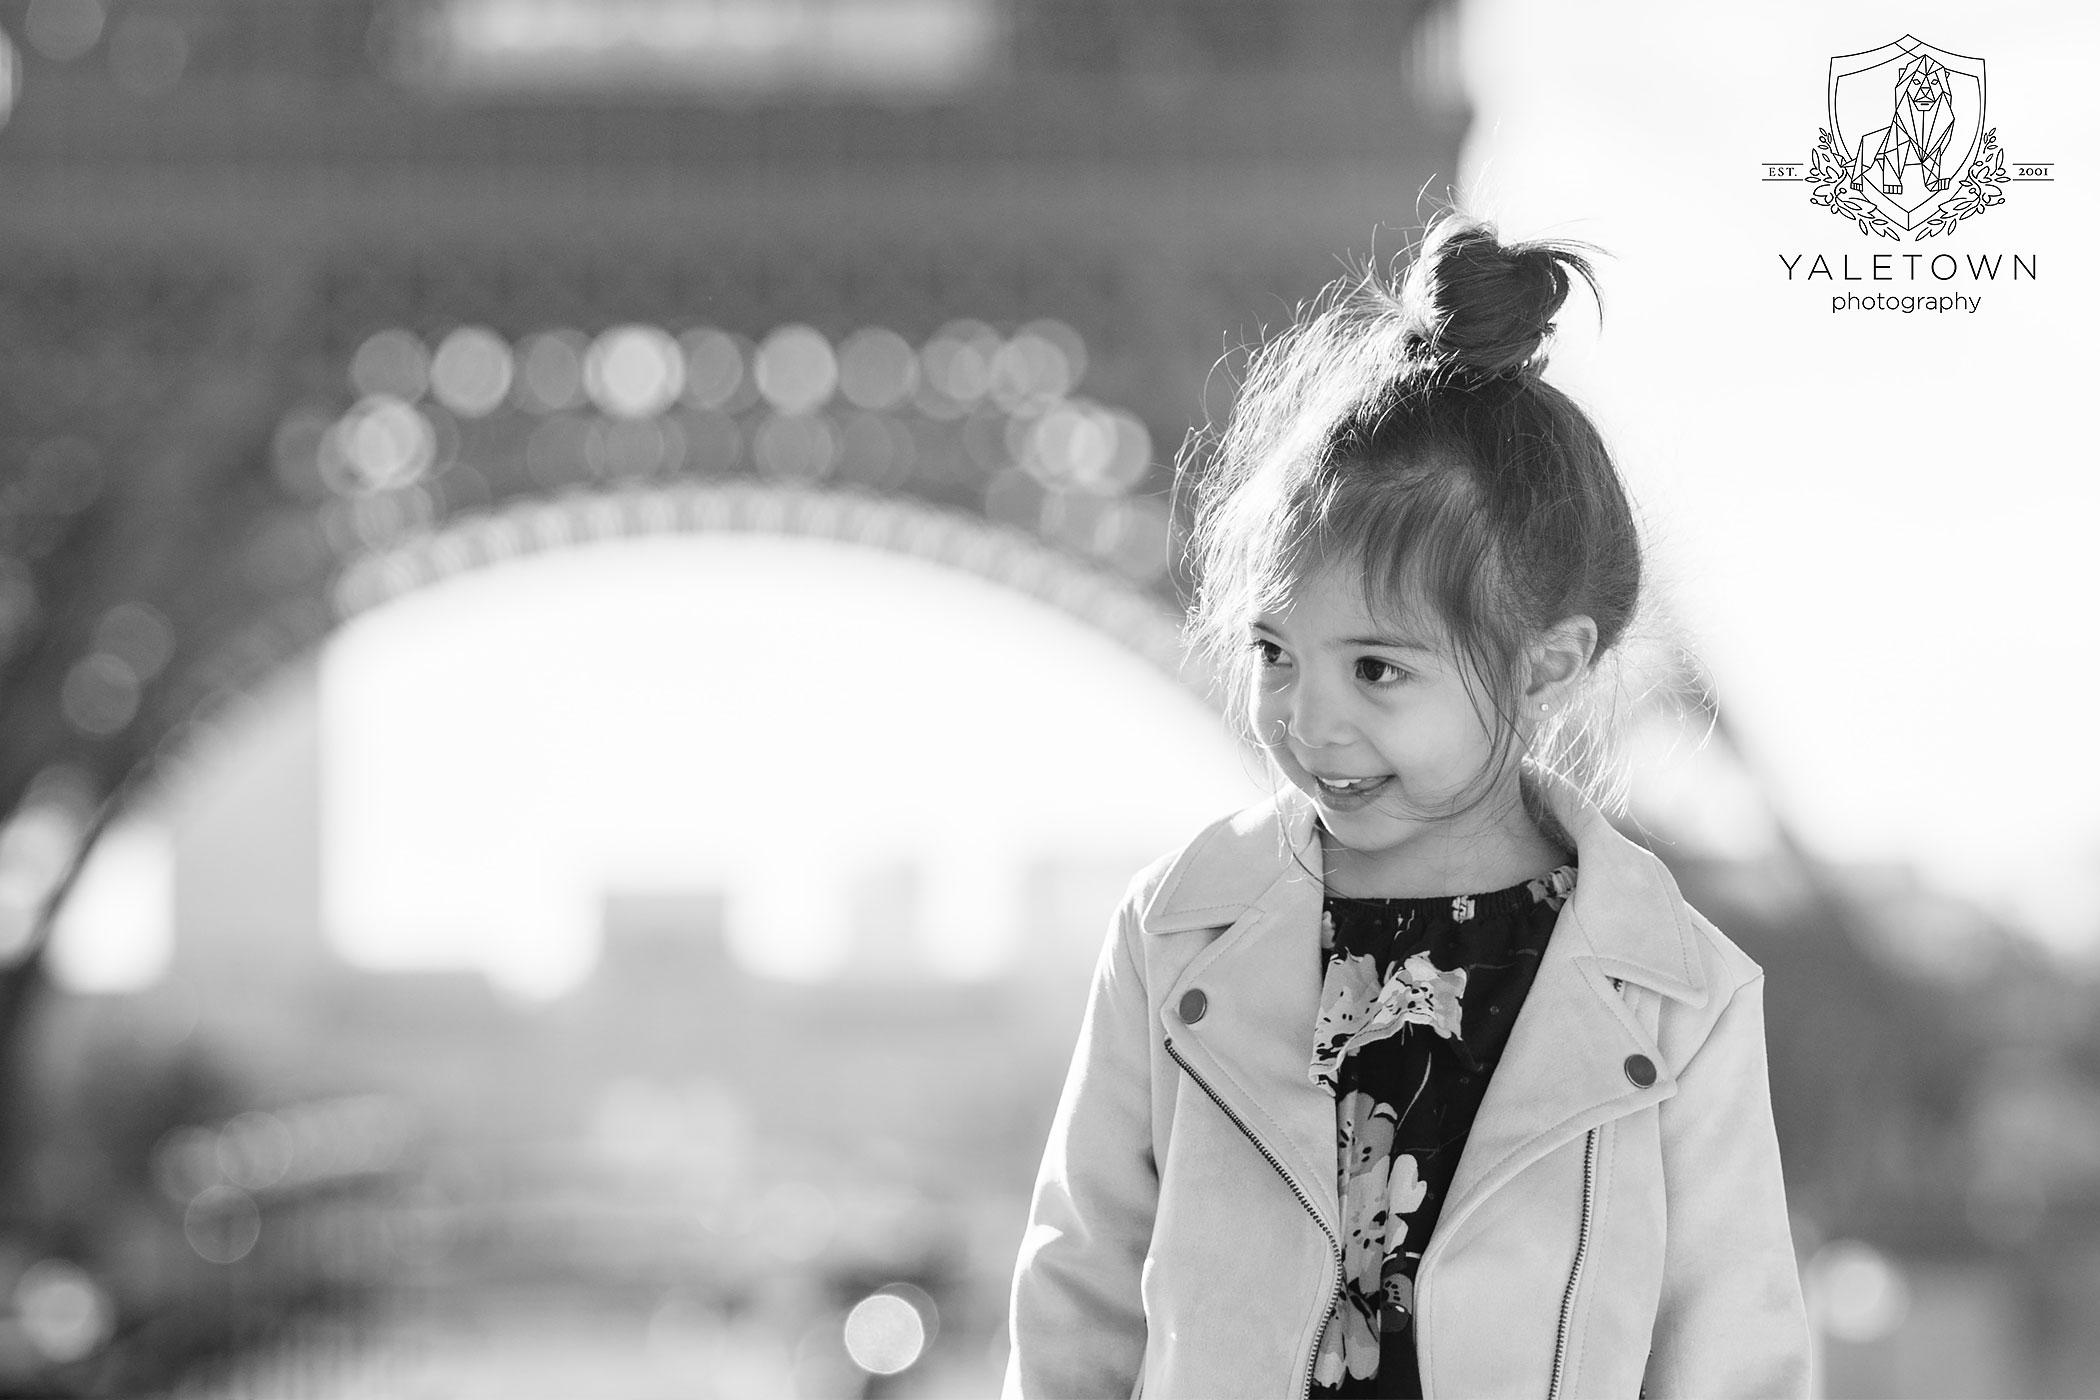 paris-family-portrait-session-eiffel-tower-pont-neuf-yaletown-photography-photo